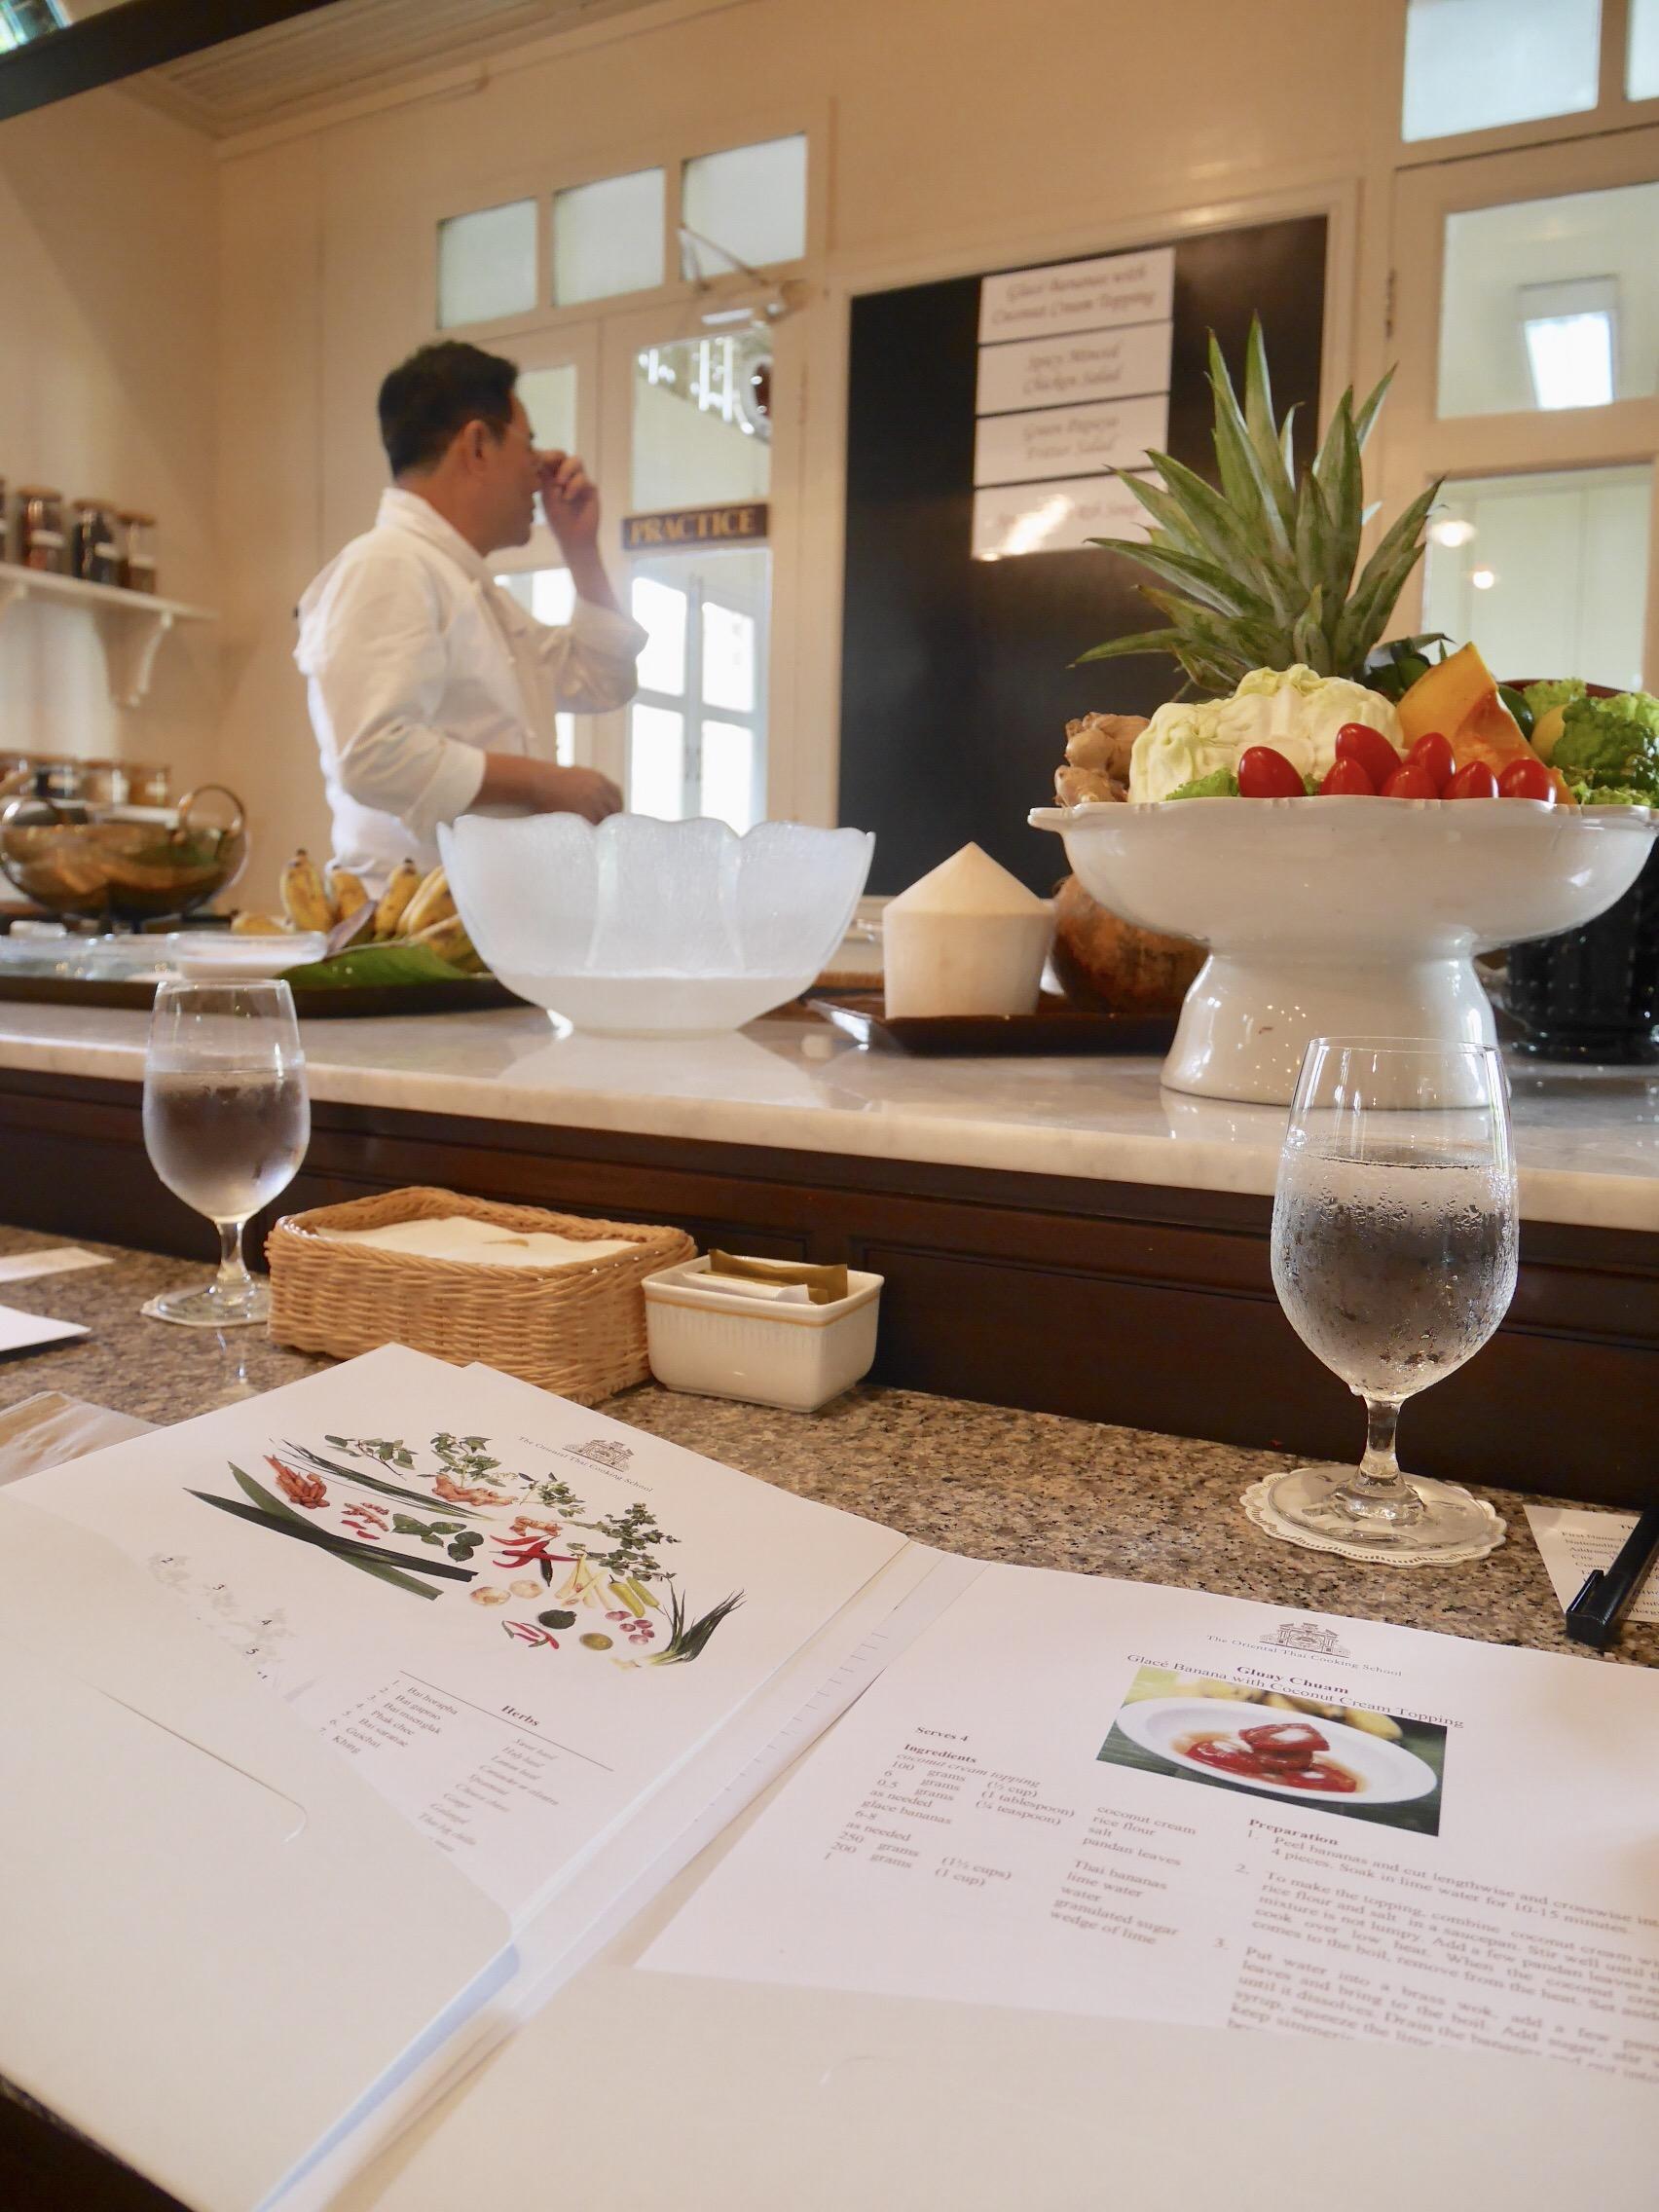 img 9094 - The Oriental Thai Cooking School - マンダリンオリエンタルバンコクのおもてなし空間で体験する絶品タイ料理教室